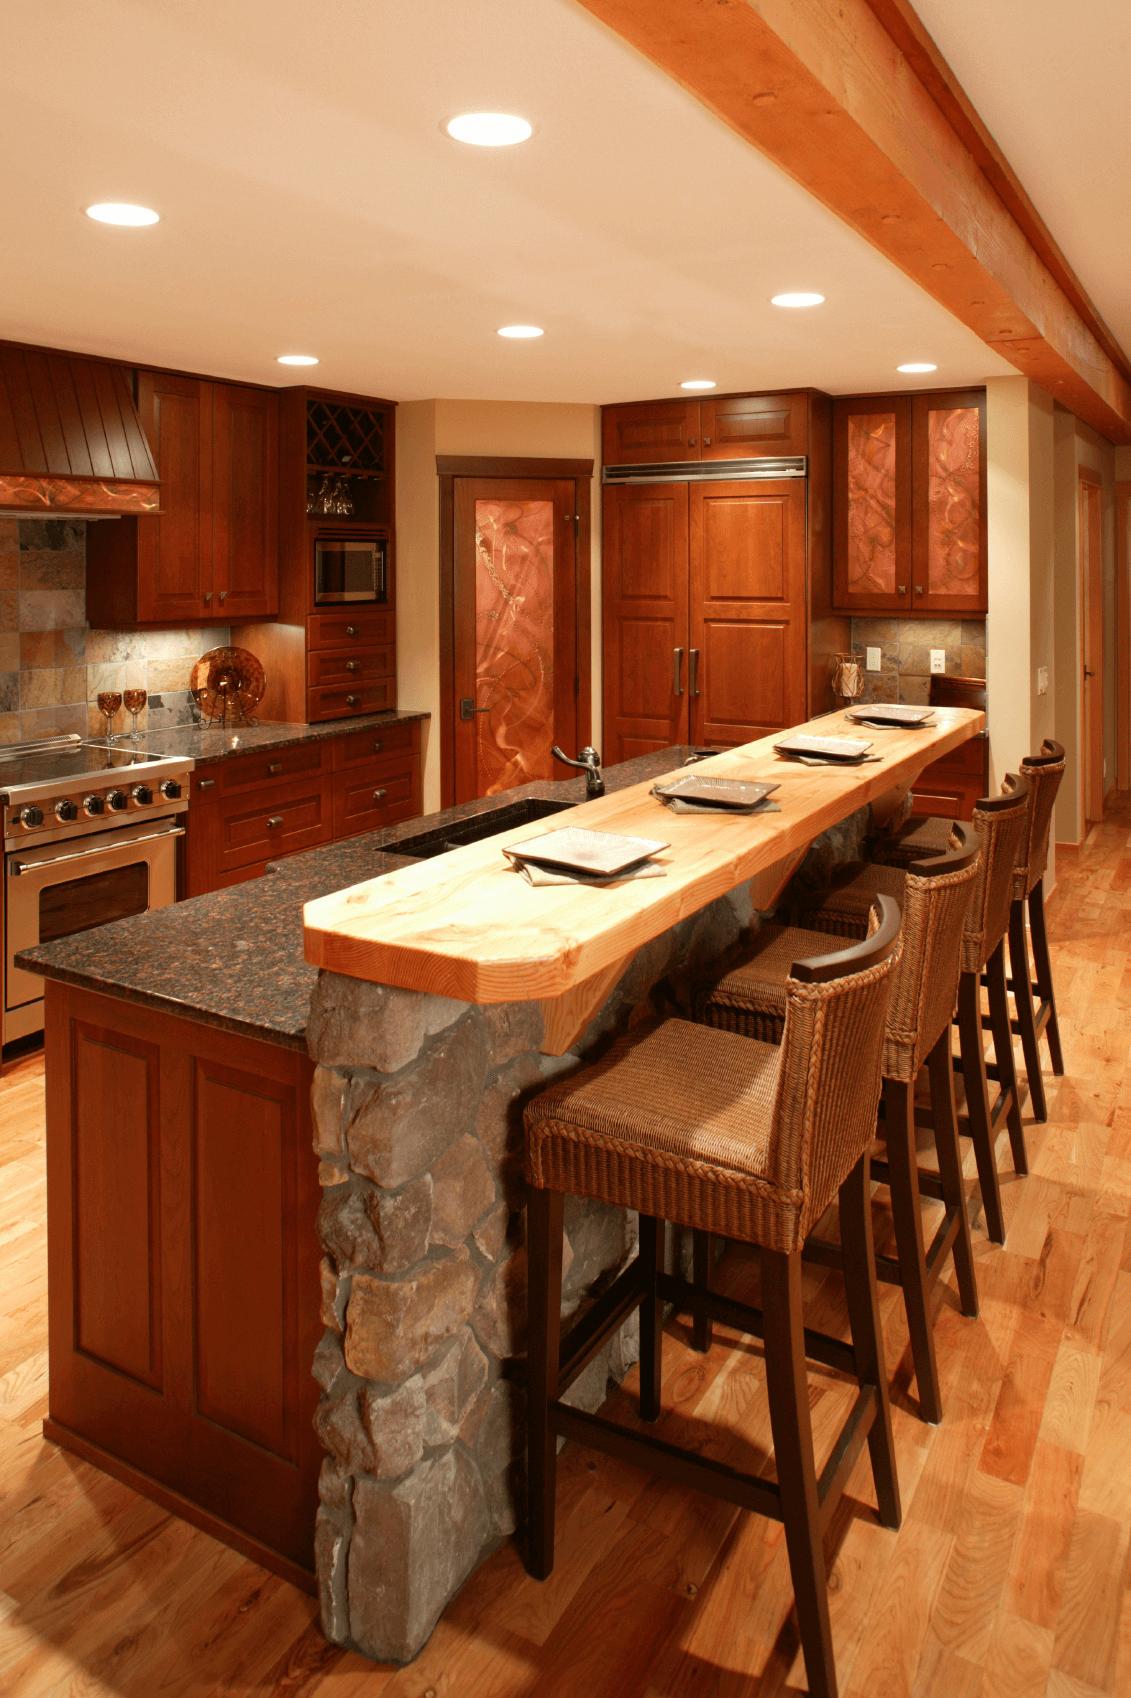 Rustic 2 Tier Kitchen Island With Breakfast Bar And Granite Top Topkitchendesigns Kitchen Bar Design Luxury Kitchen Island Luxury Kitchens